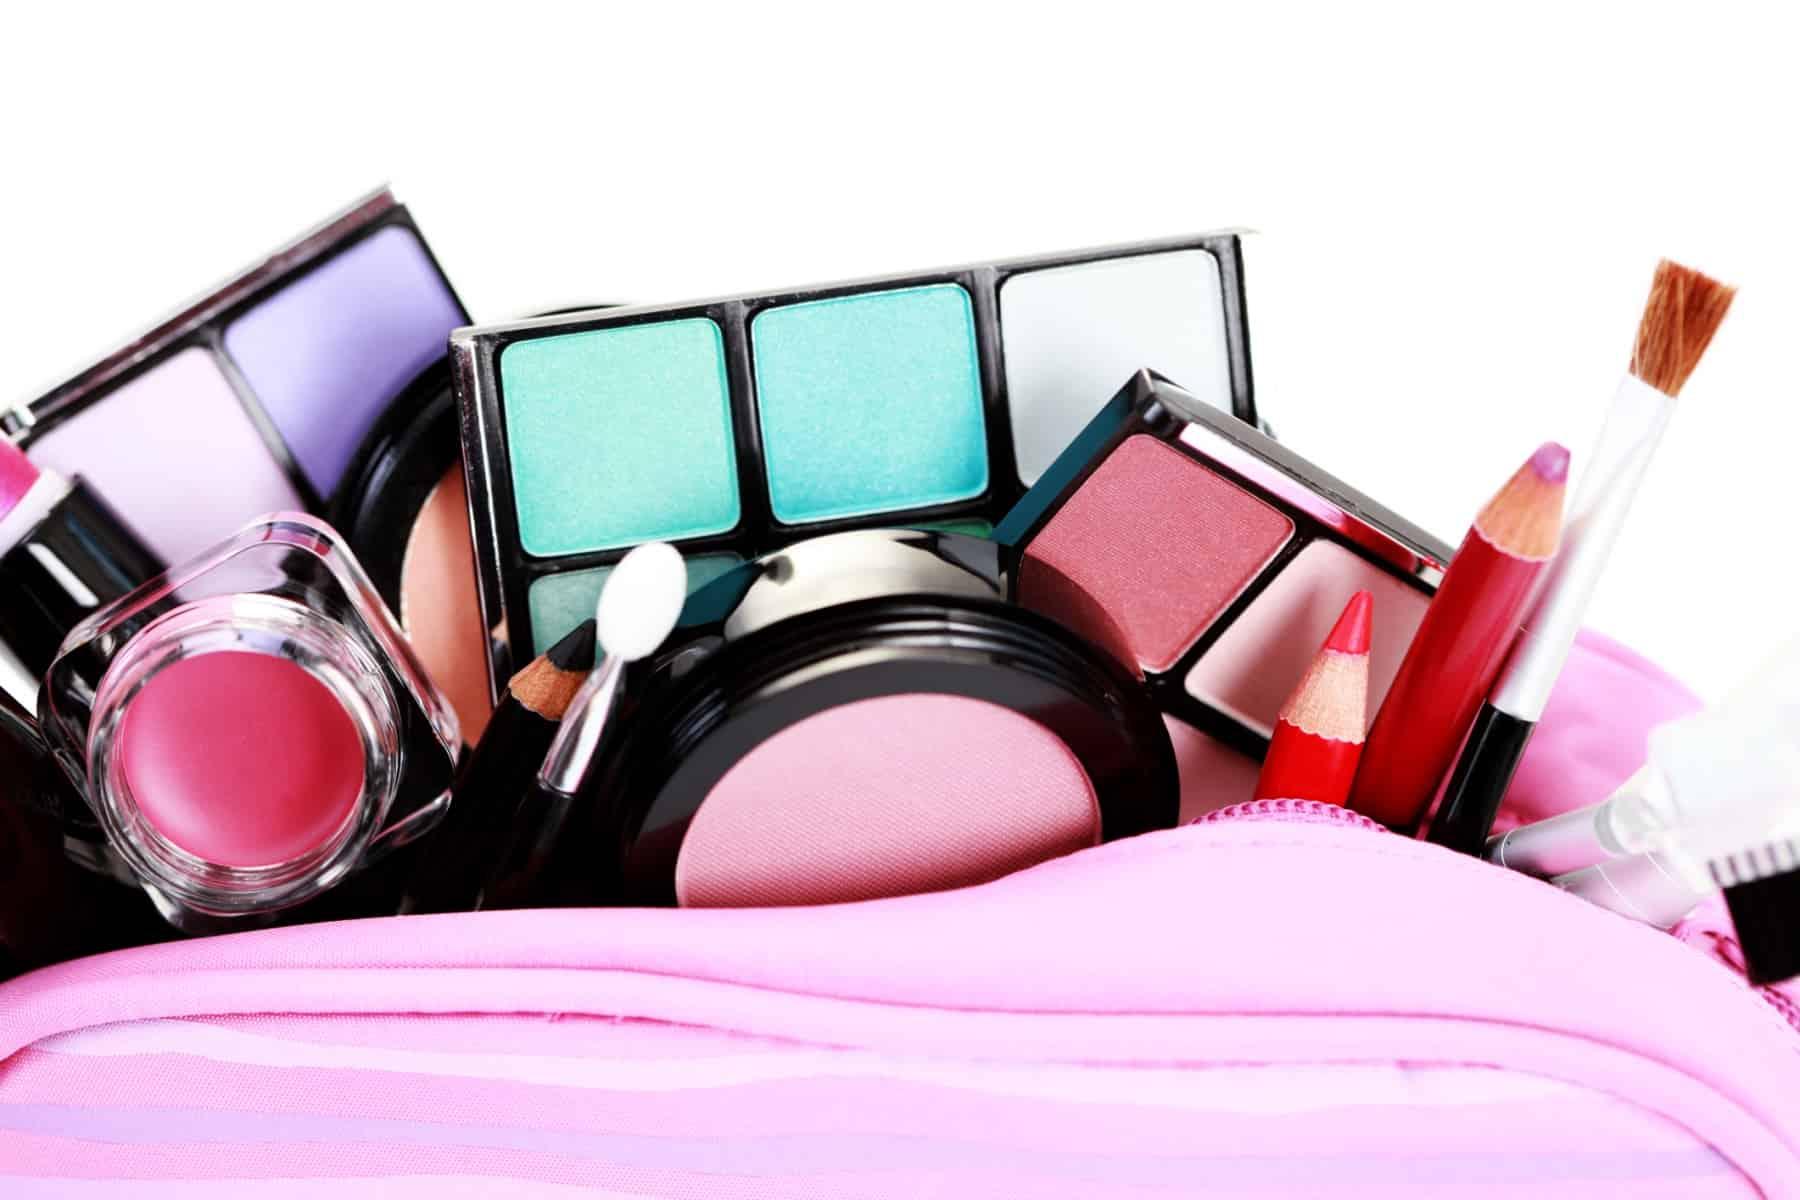 Pasos para comerciar con productos cosméticos